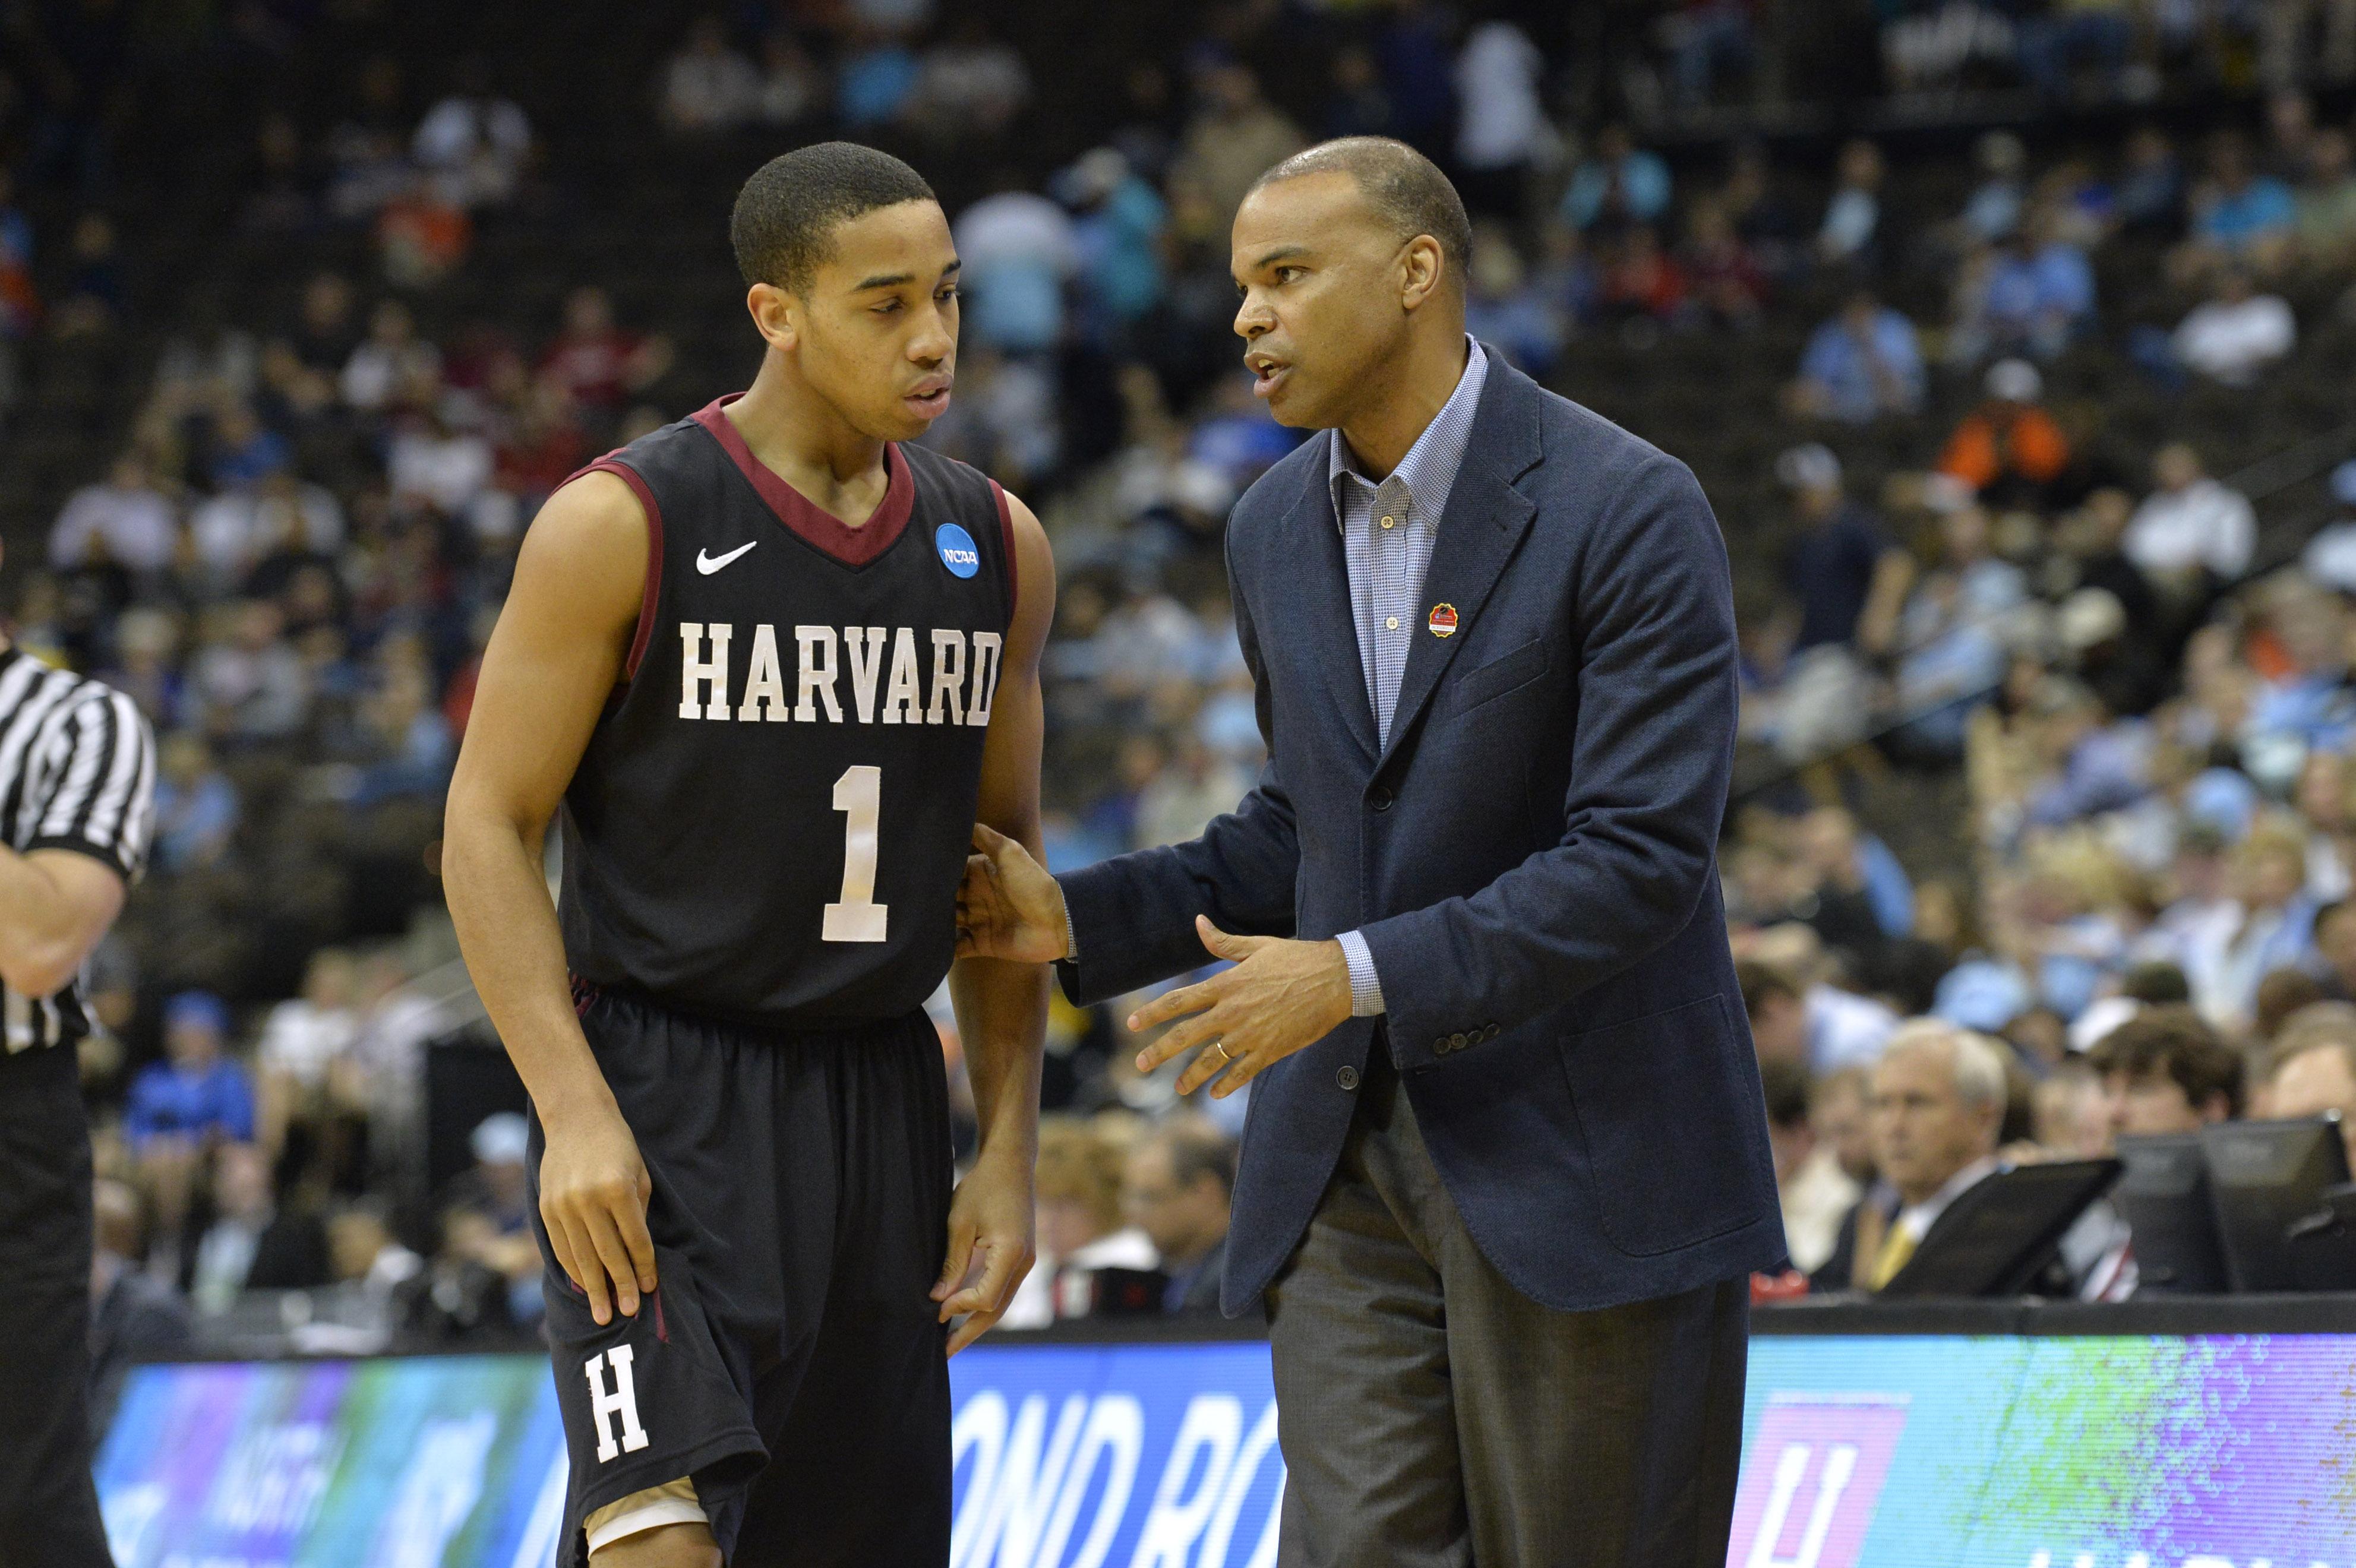 harvard basketball pushes education through athletics | ncaa